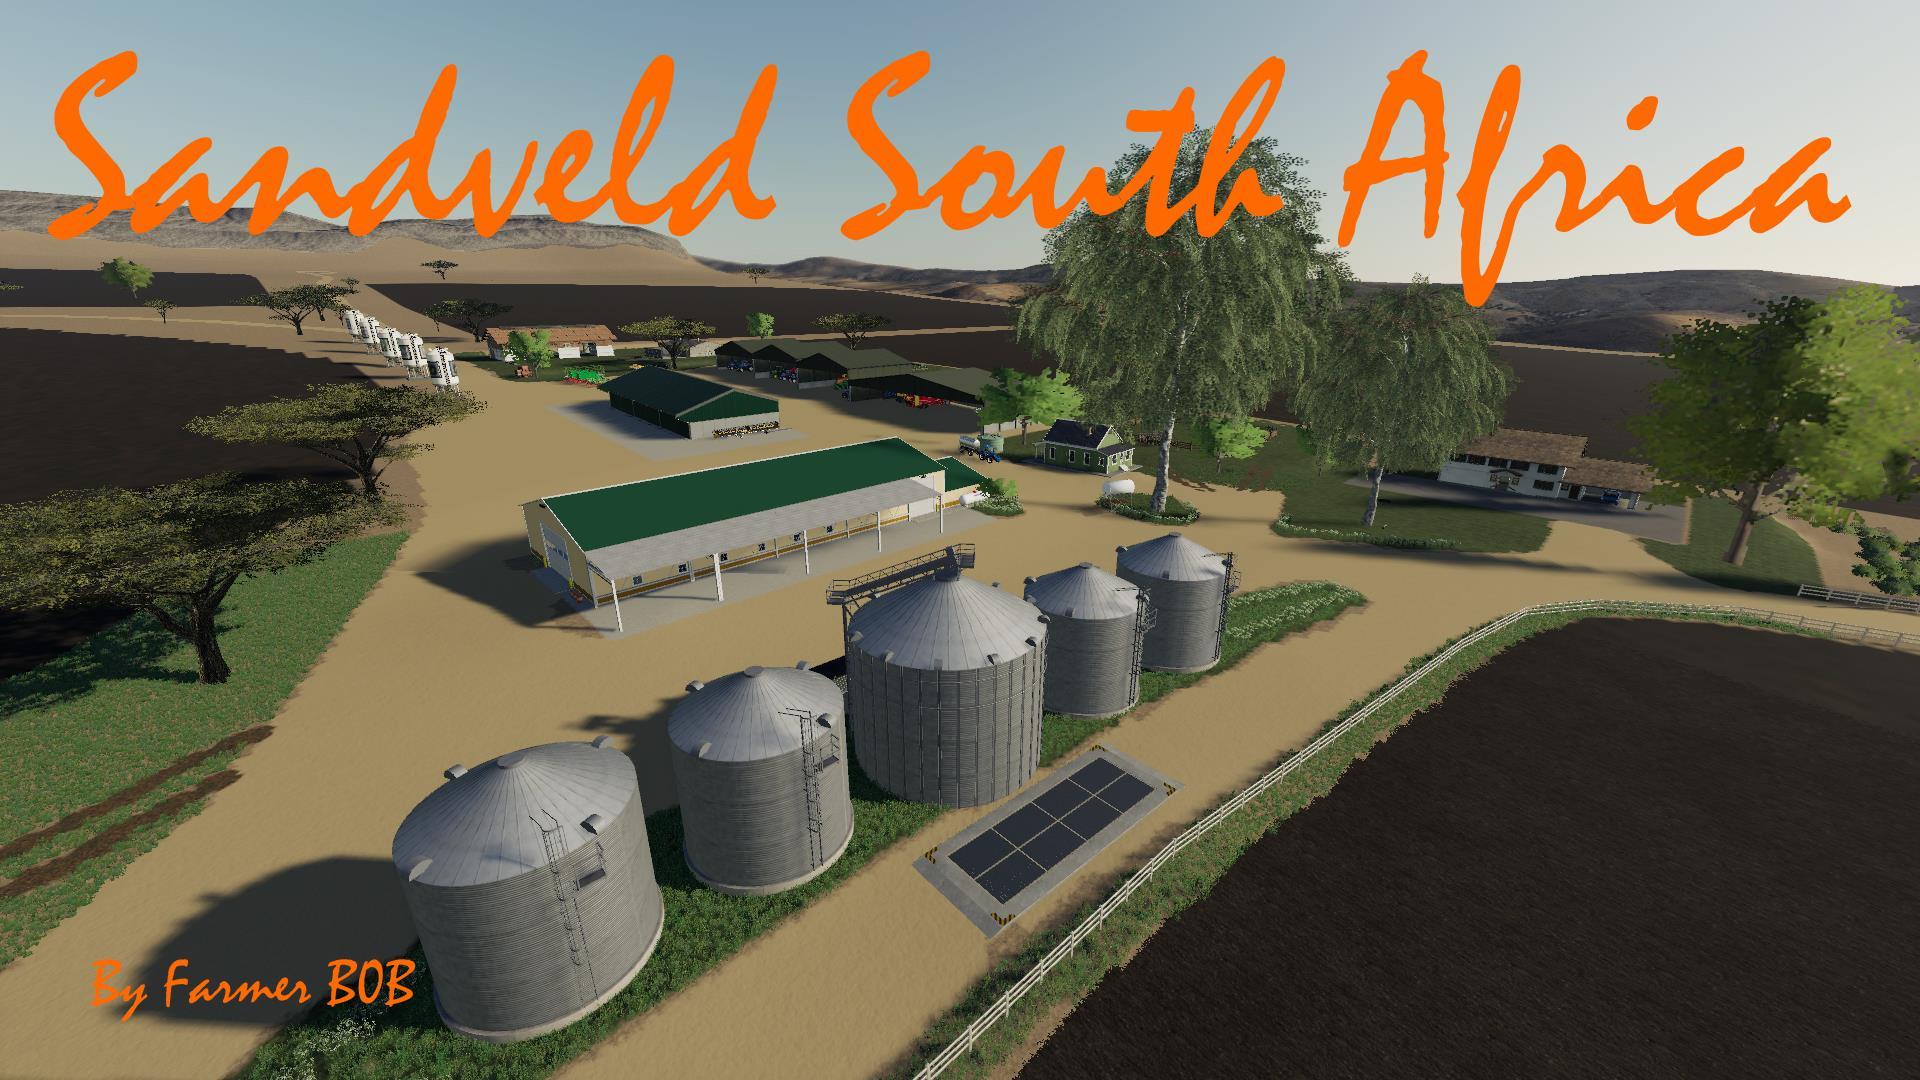 Sandveld South Africa Map V001